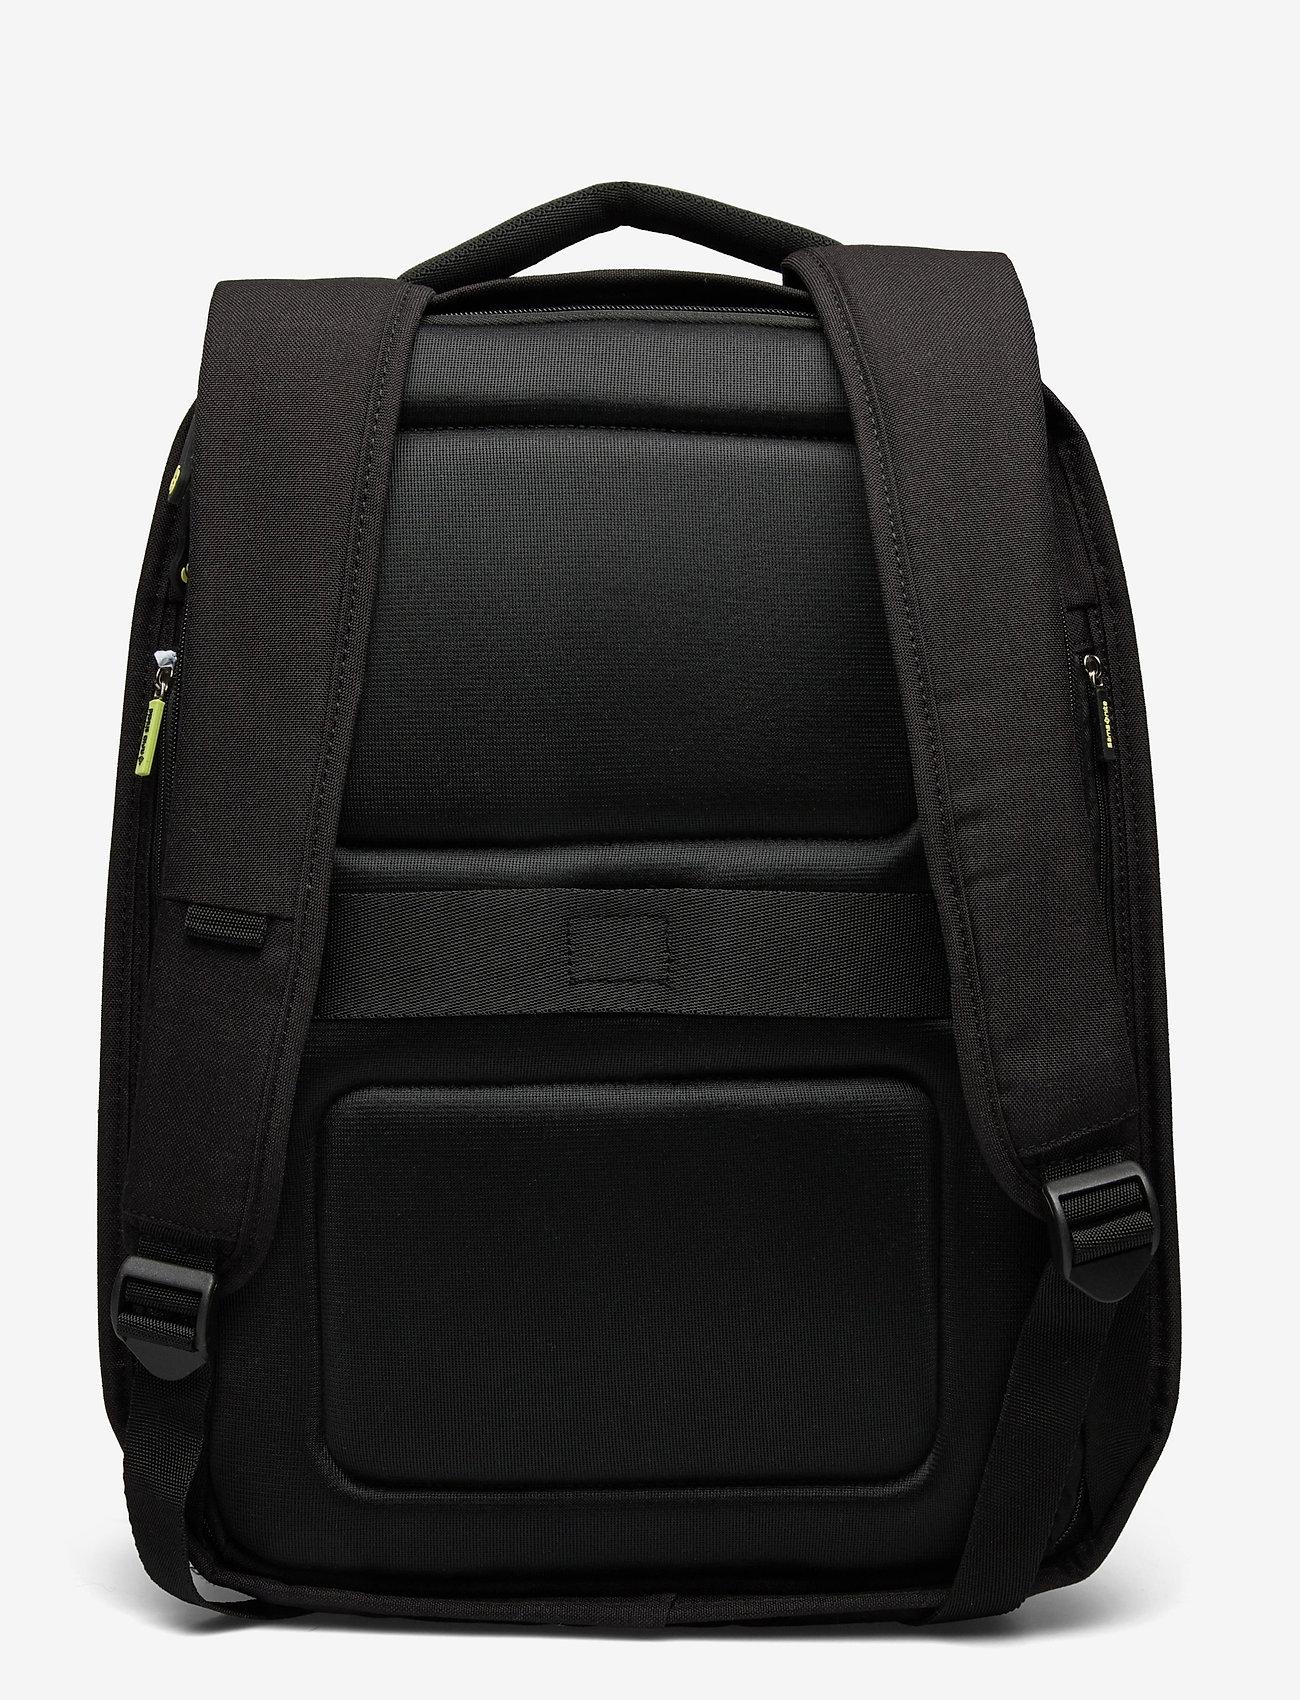 "Samsonite - Securipak Datorryggsäck 15.6"" - nieuwe mode - black - 1"